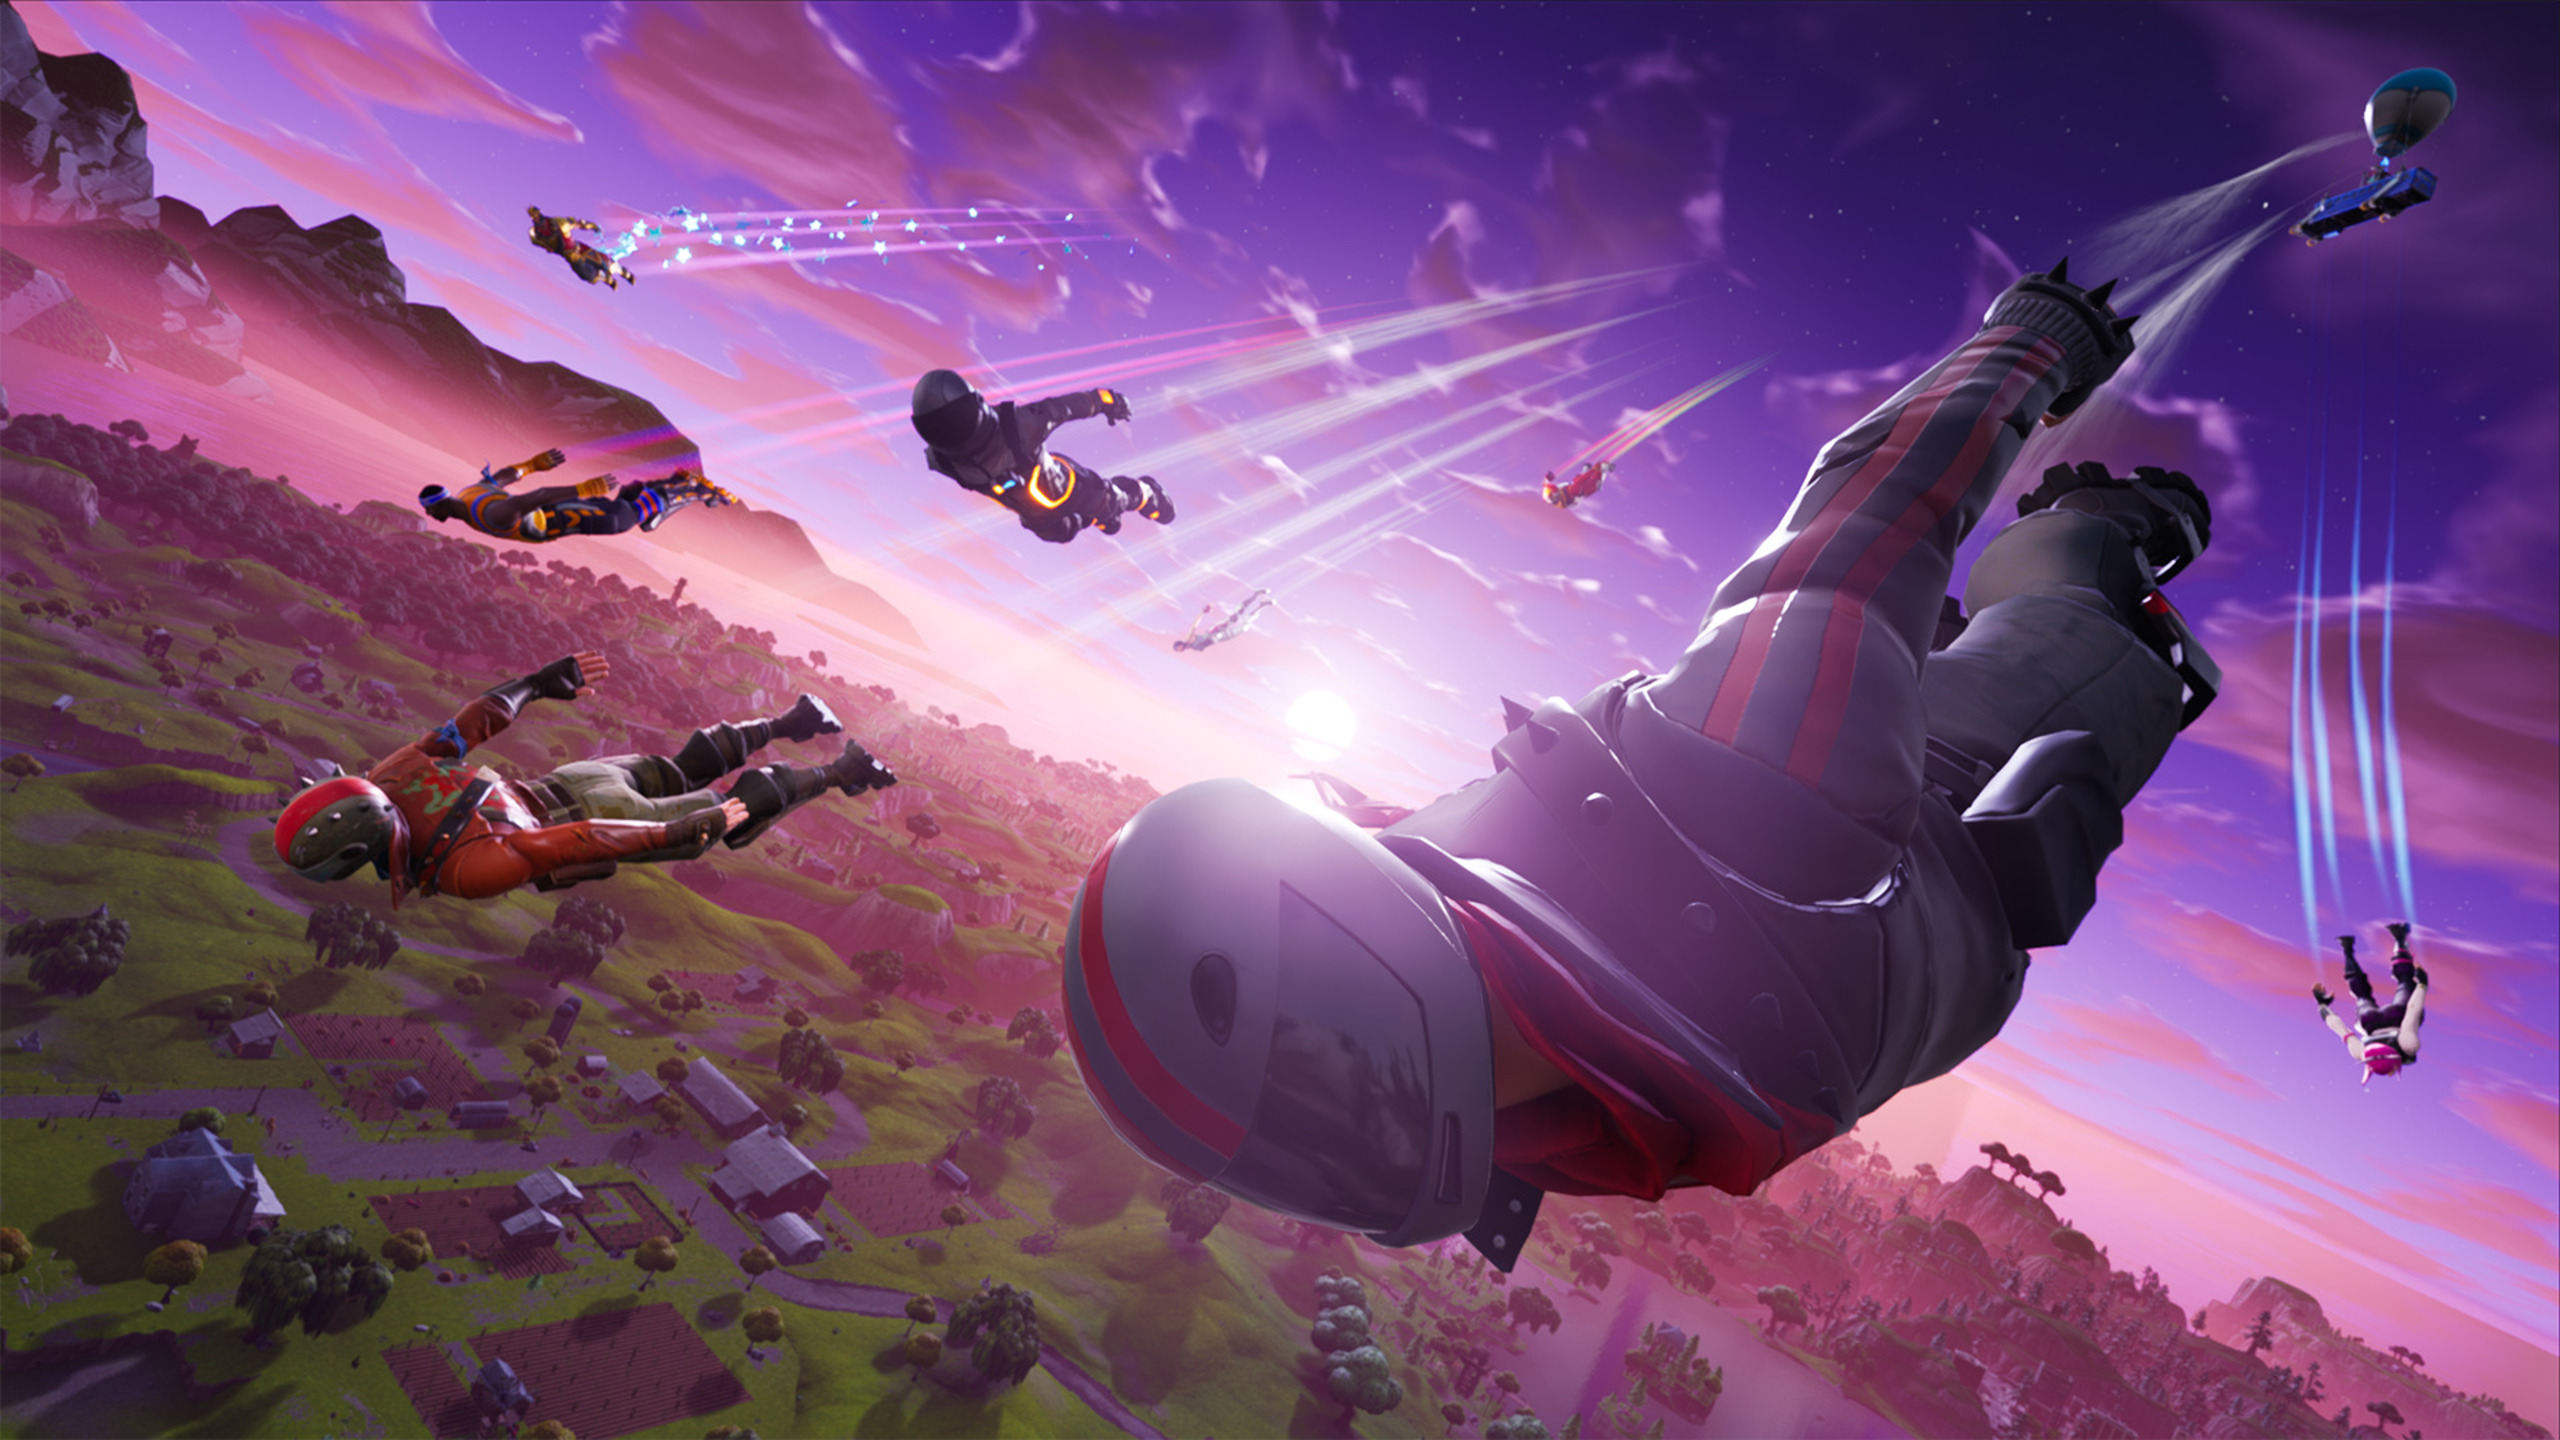 Cool Fortnite Pictures 2560x1440 Free V Bucks Com Xbox One